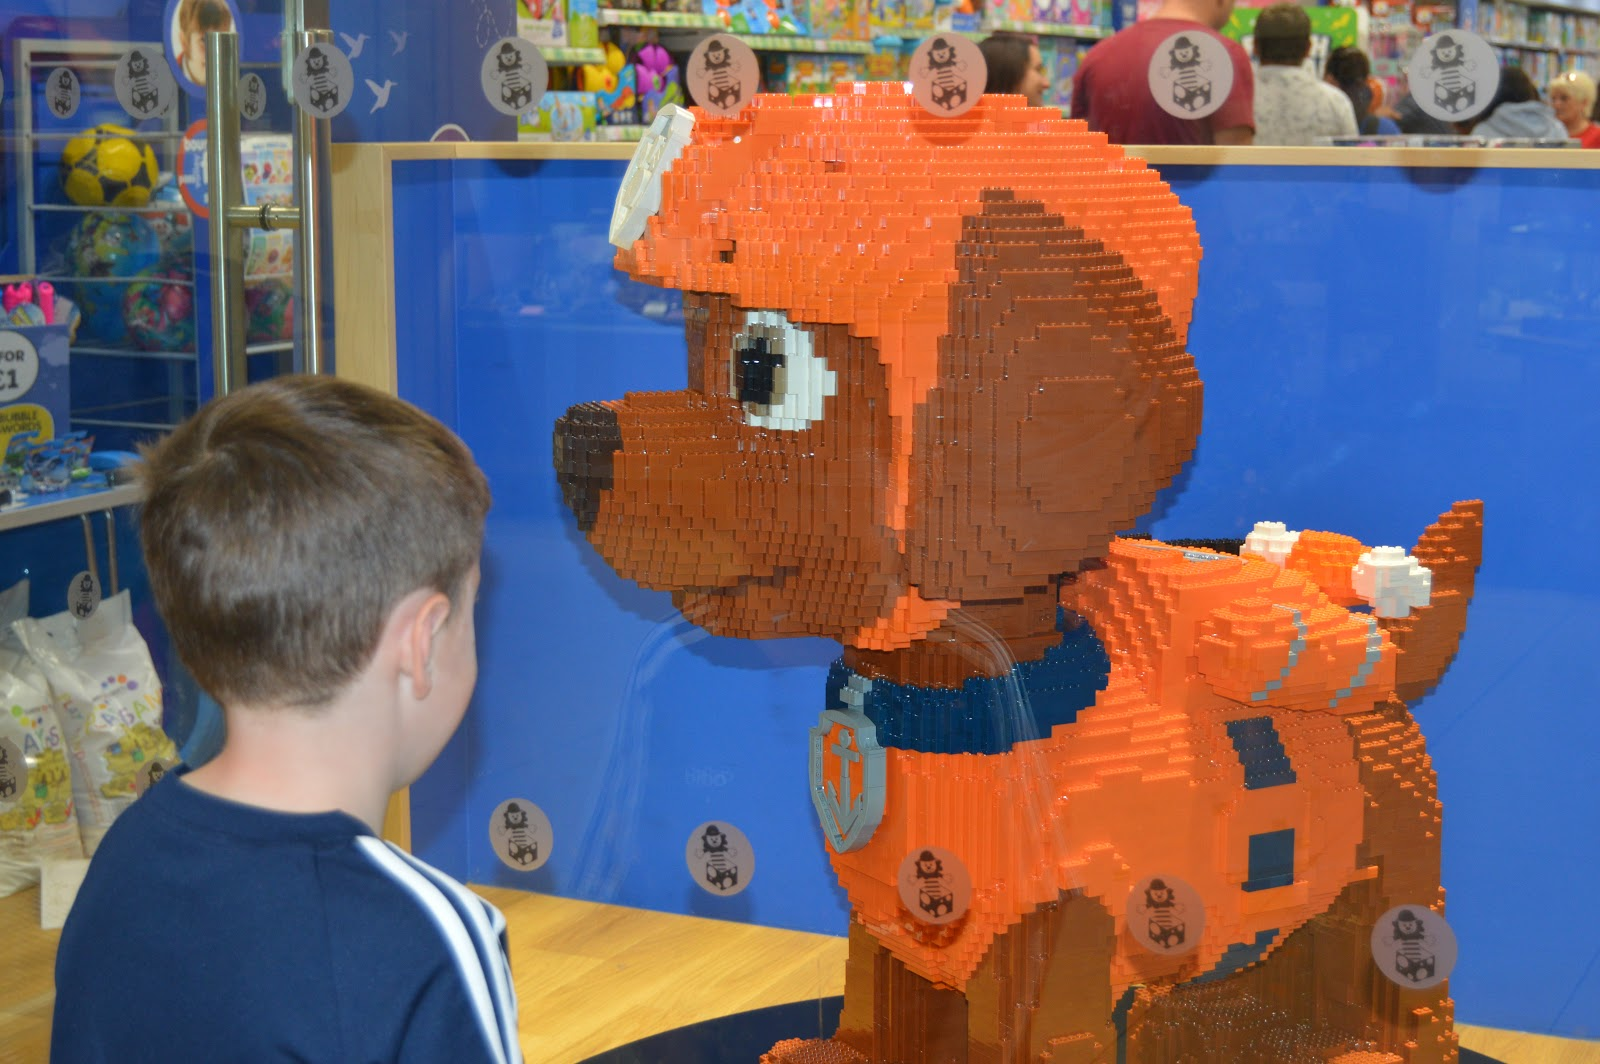 Paw Patrol lego bricks